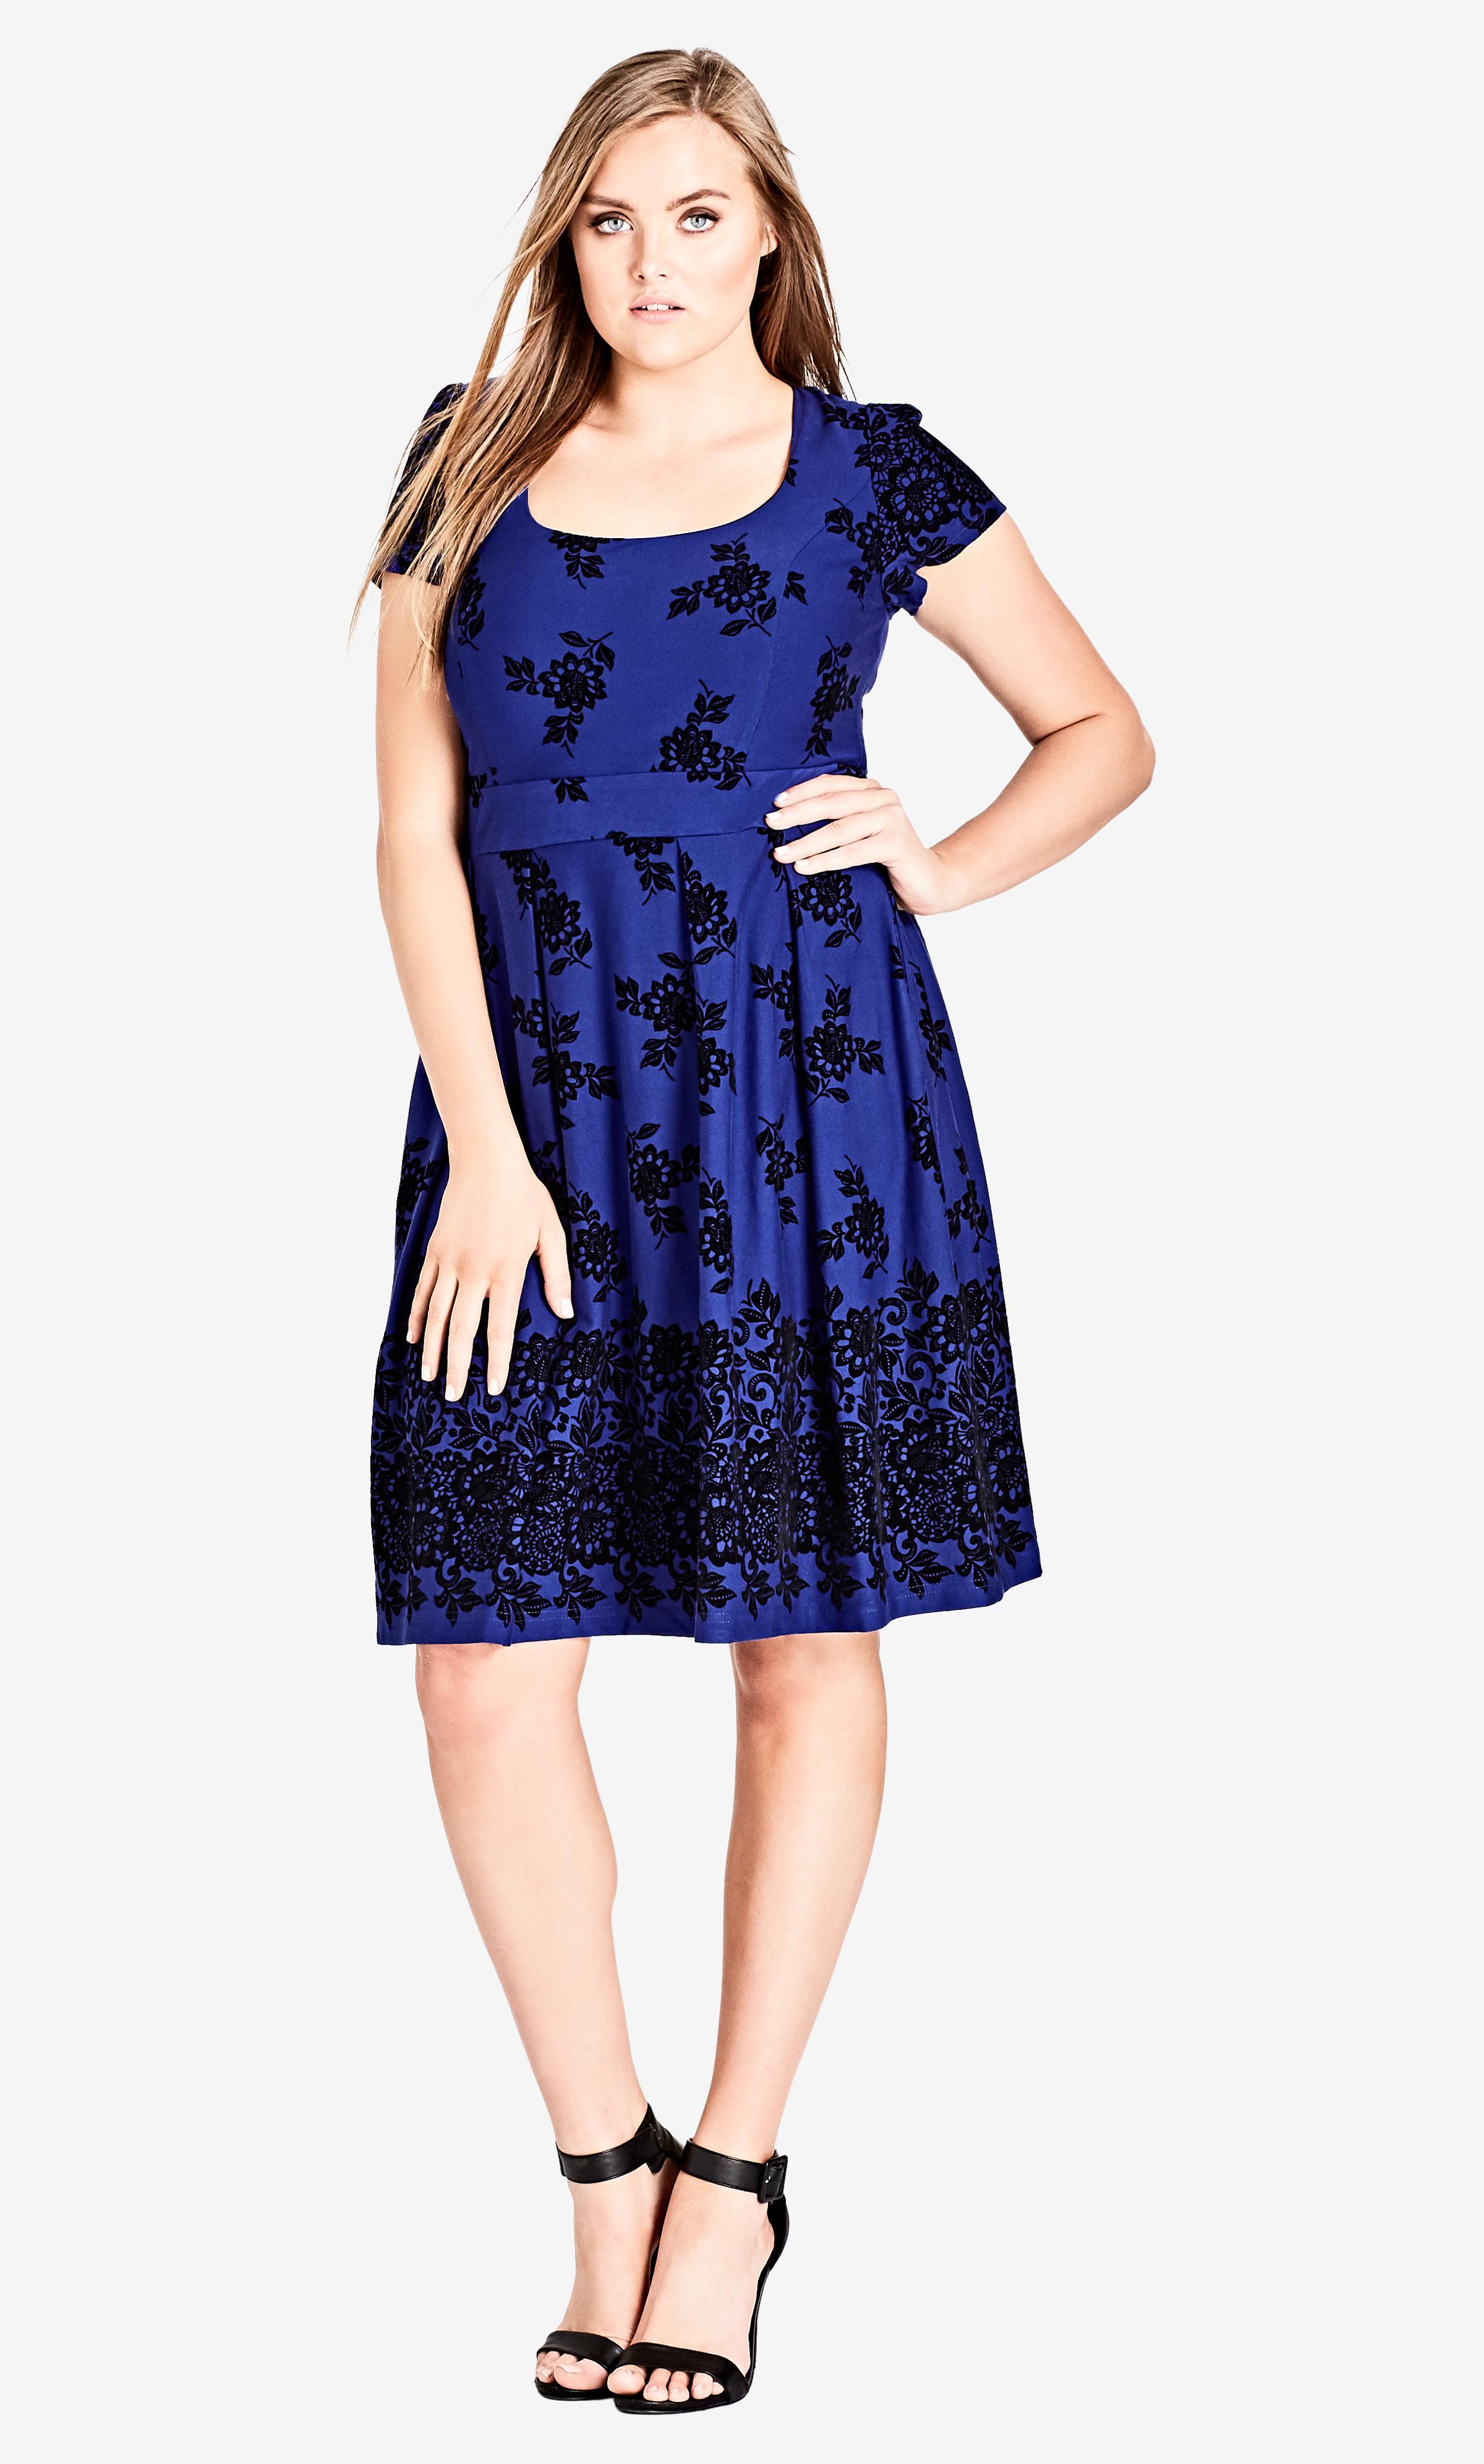 d47b13dc105 Lyst - City Chic Lace Flock Dress in Blue